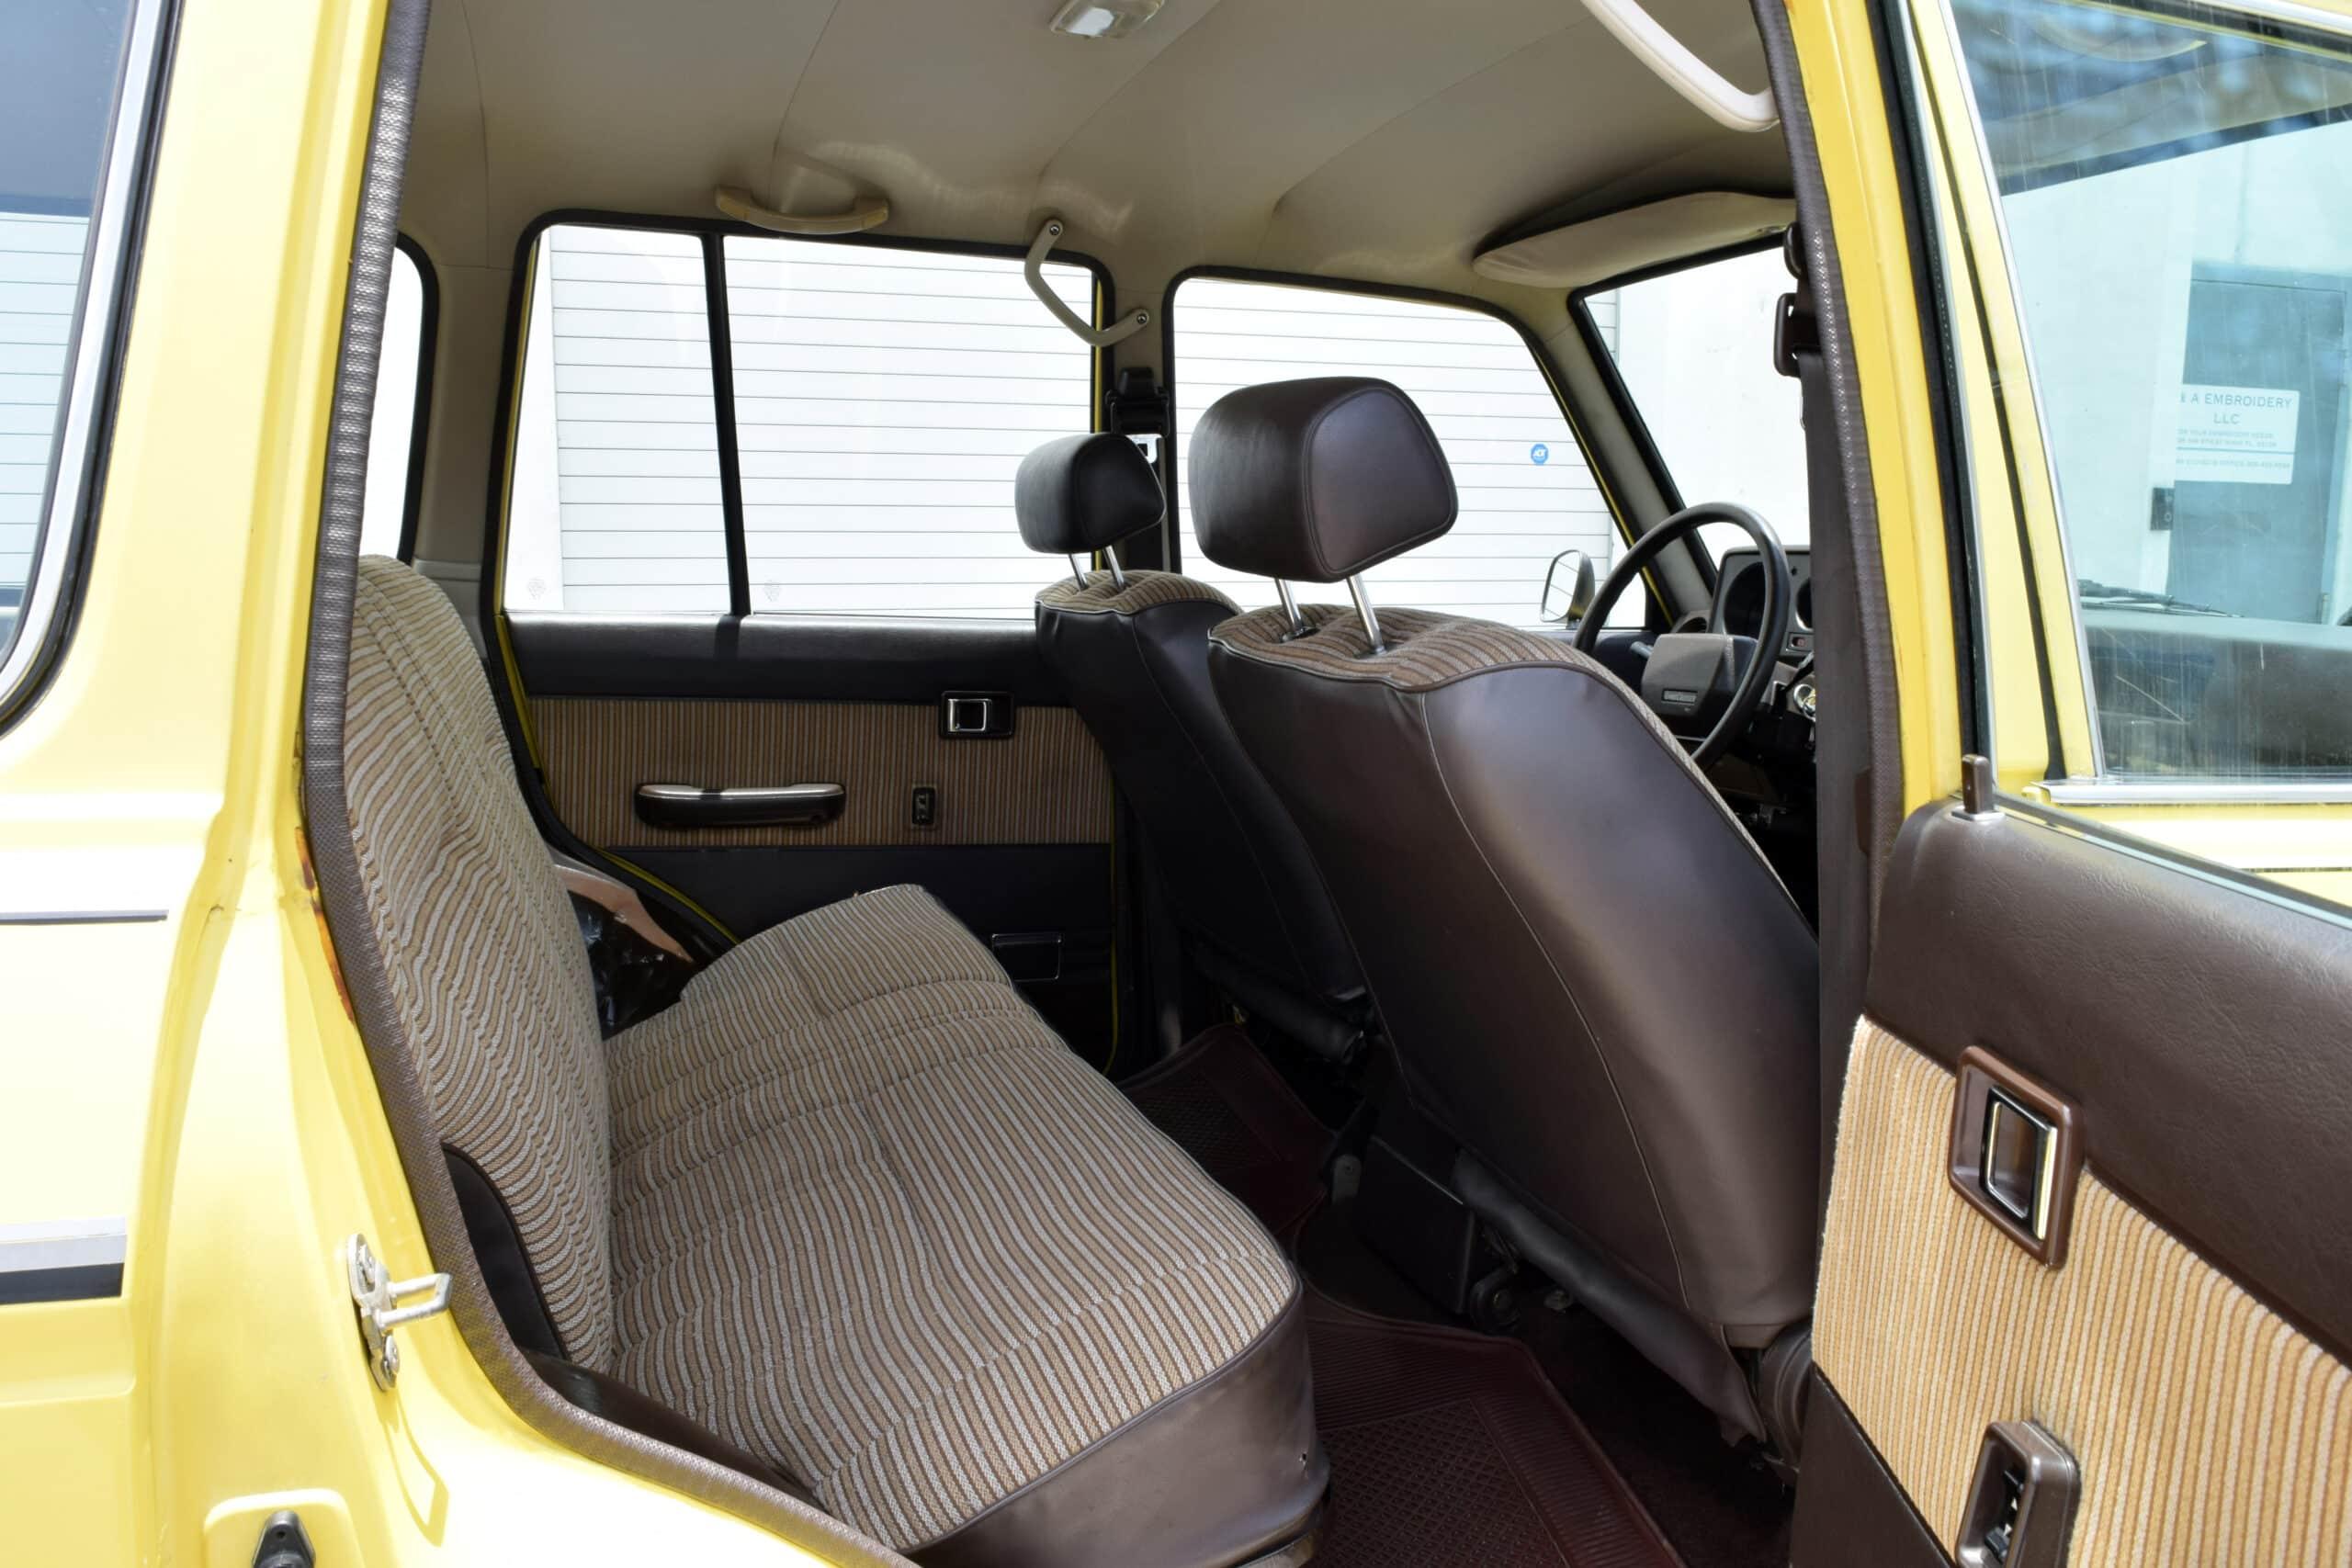 1985 Toyota FJ60, Rare and original Wimbledon Yellow, 3F Gasoline engine with 5 Speed, Original Interior